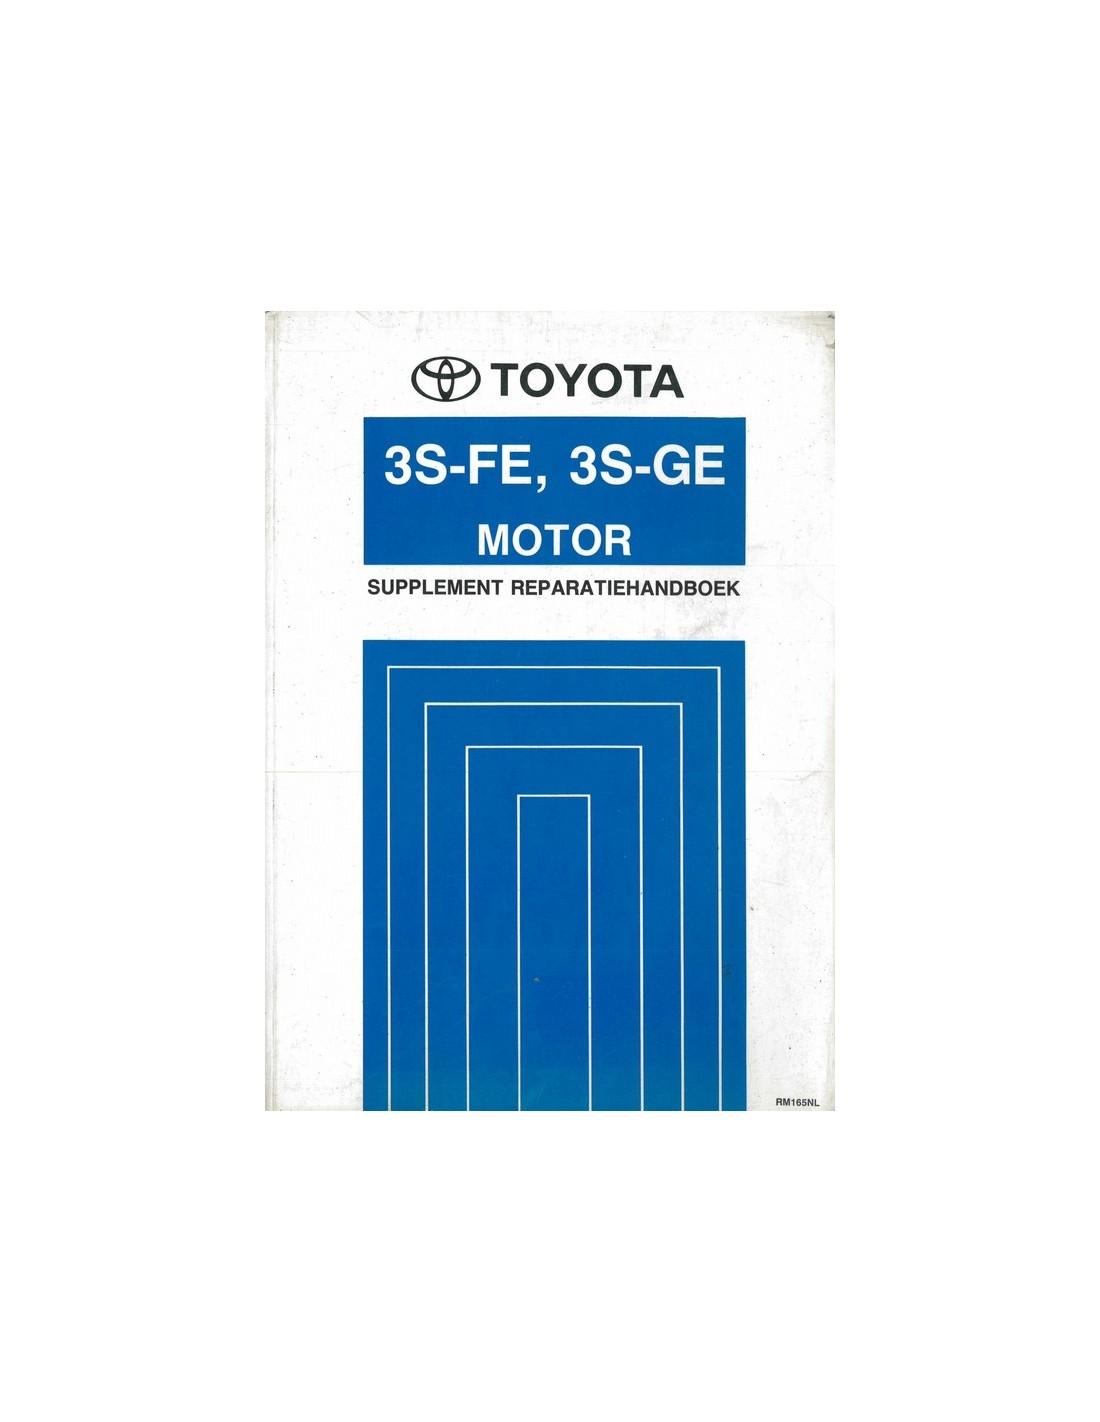 1990 toyota mr2 3s fe 3s ge engine repair manual dutch rh autolit eu toyota 3s-fe engine service and repair manual.pdf Toyota 3.4 Engine